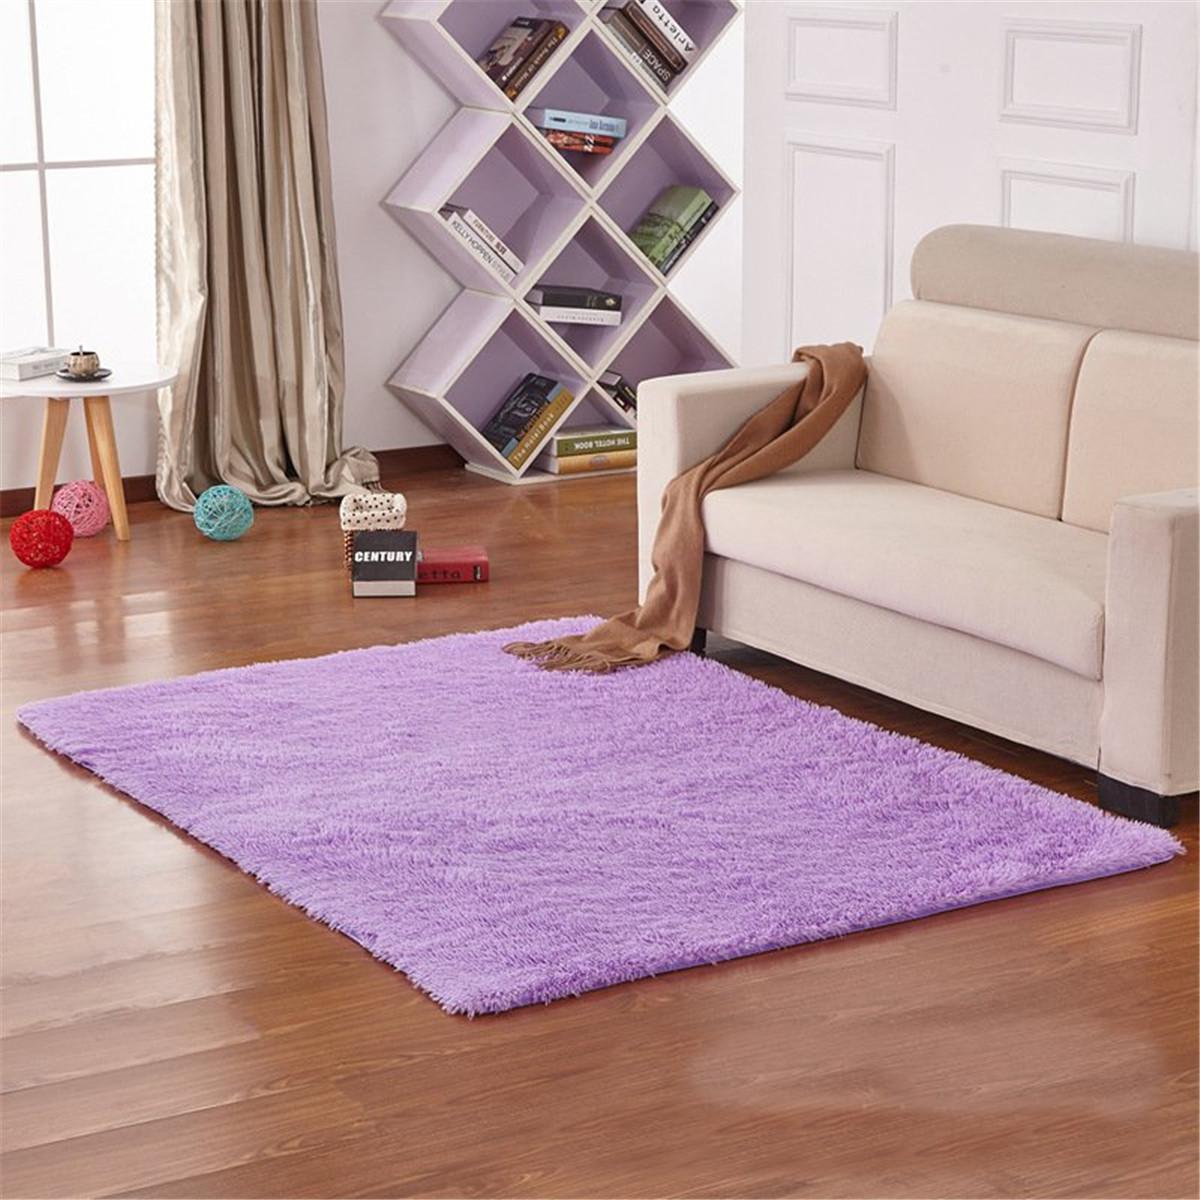 ... Anti Skid Carpet Flokati Shaggy Rug Living Bedroom Floor Mat. Source · circle round soft shaggy rug kids children living room bedro